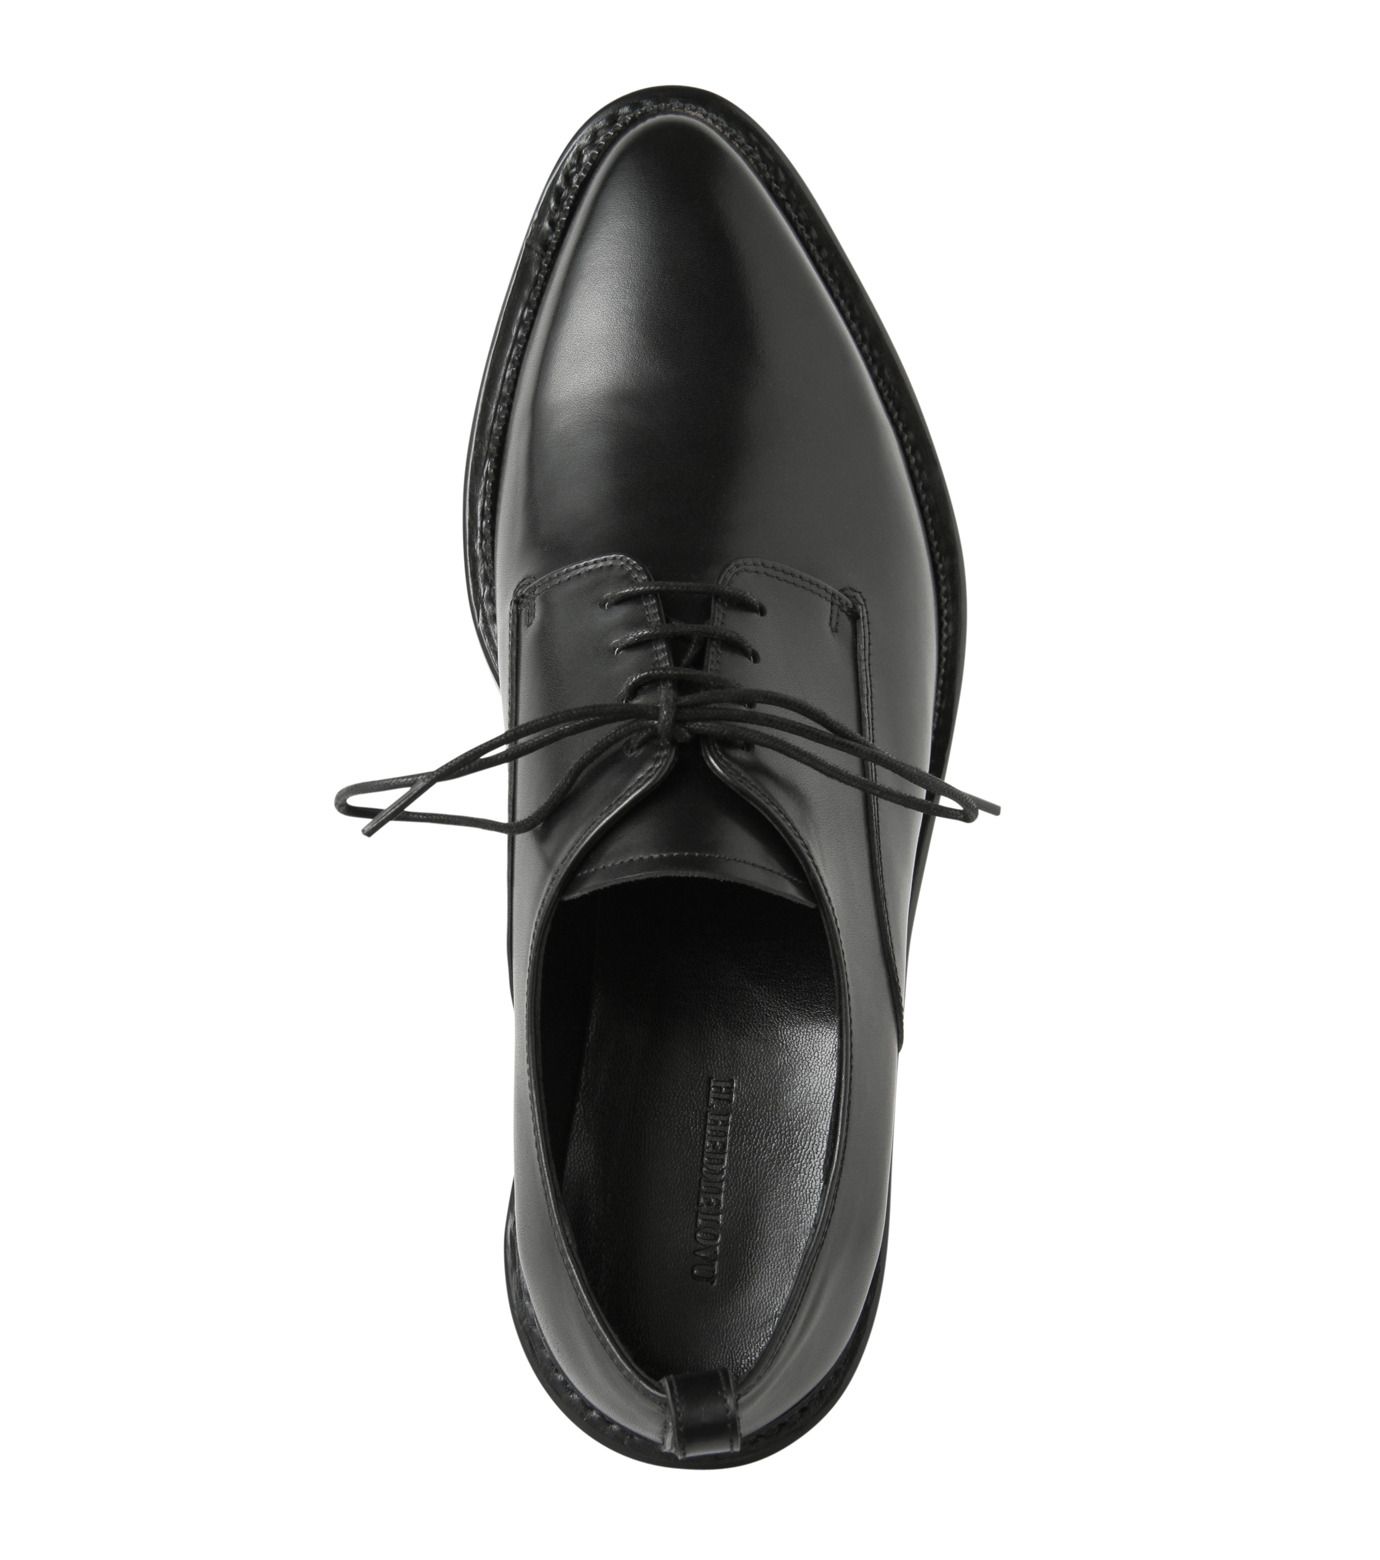 HL HEDDIE LOVU(エイチエル・エディールーヴ)のSHIRKSOLE SHOES-BLACK(シューズ/shoes)-18S90001-13 拡大詳細画像4